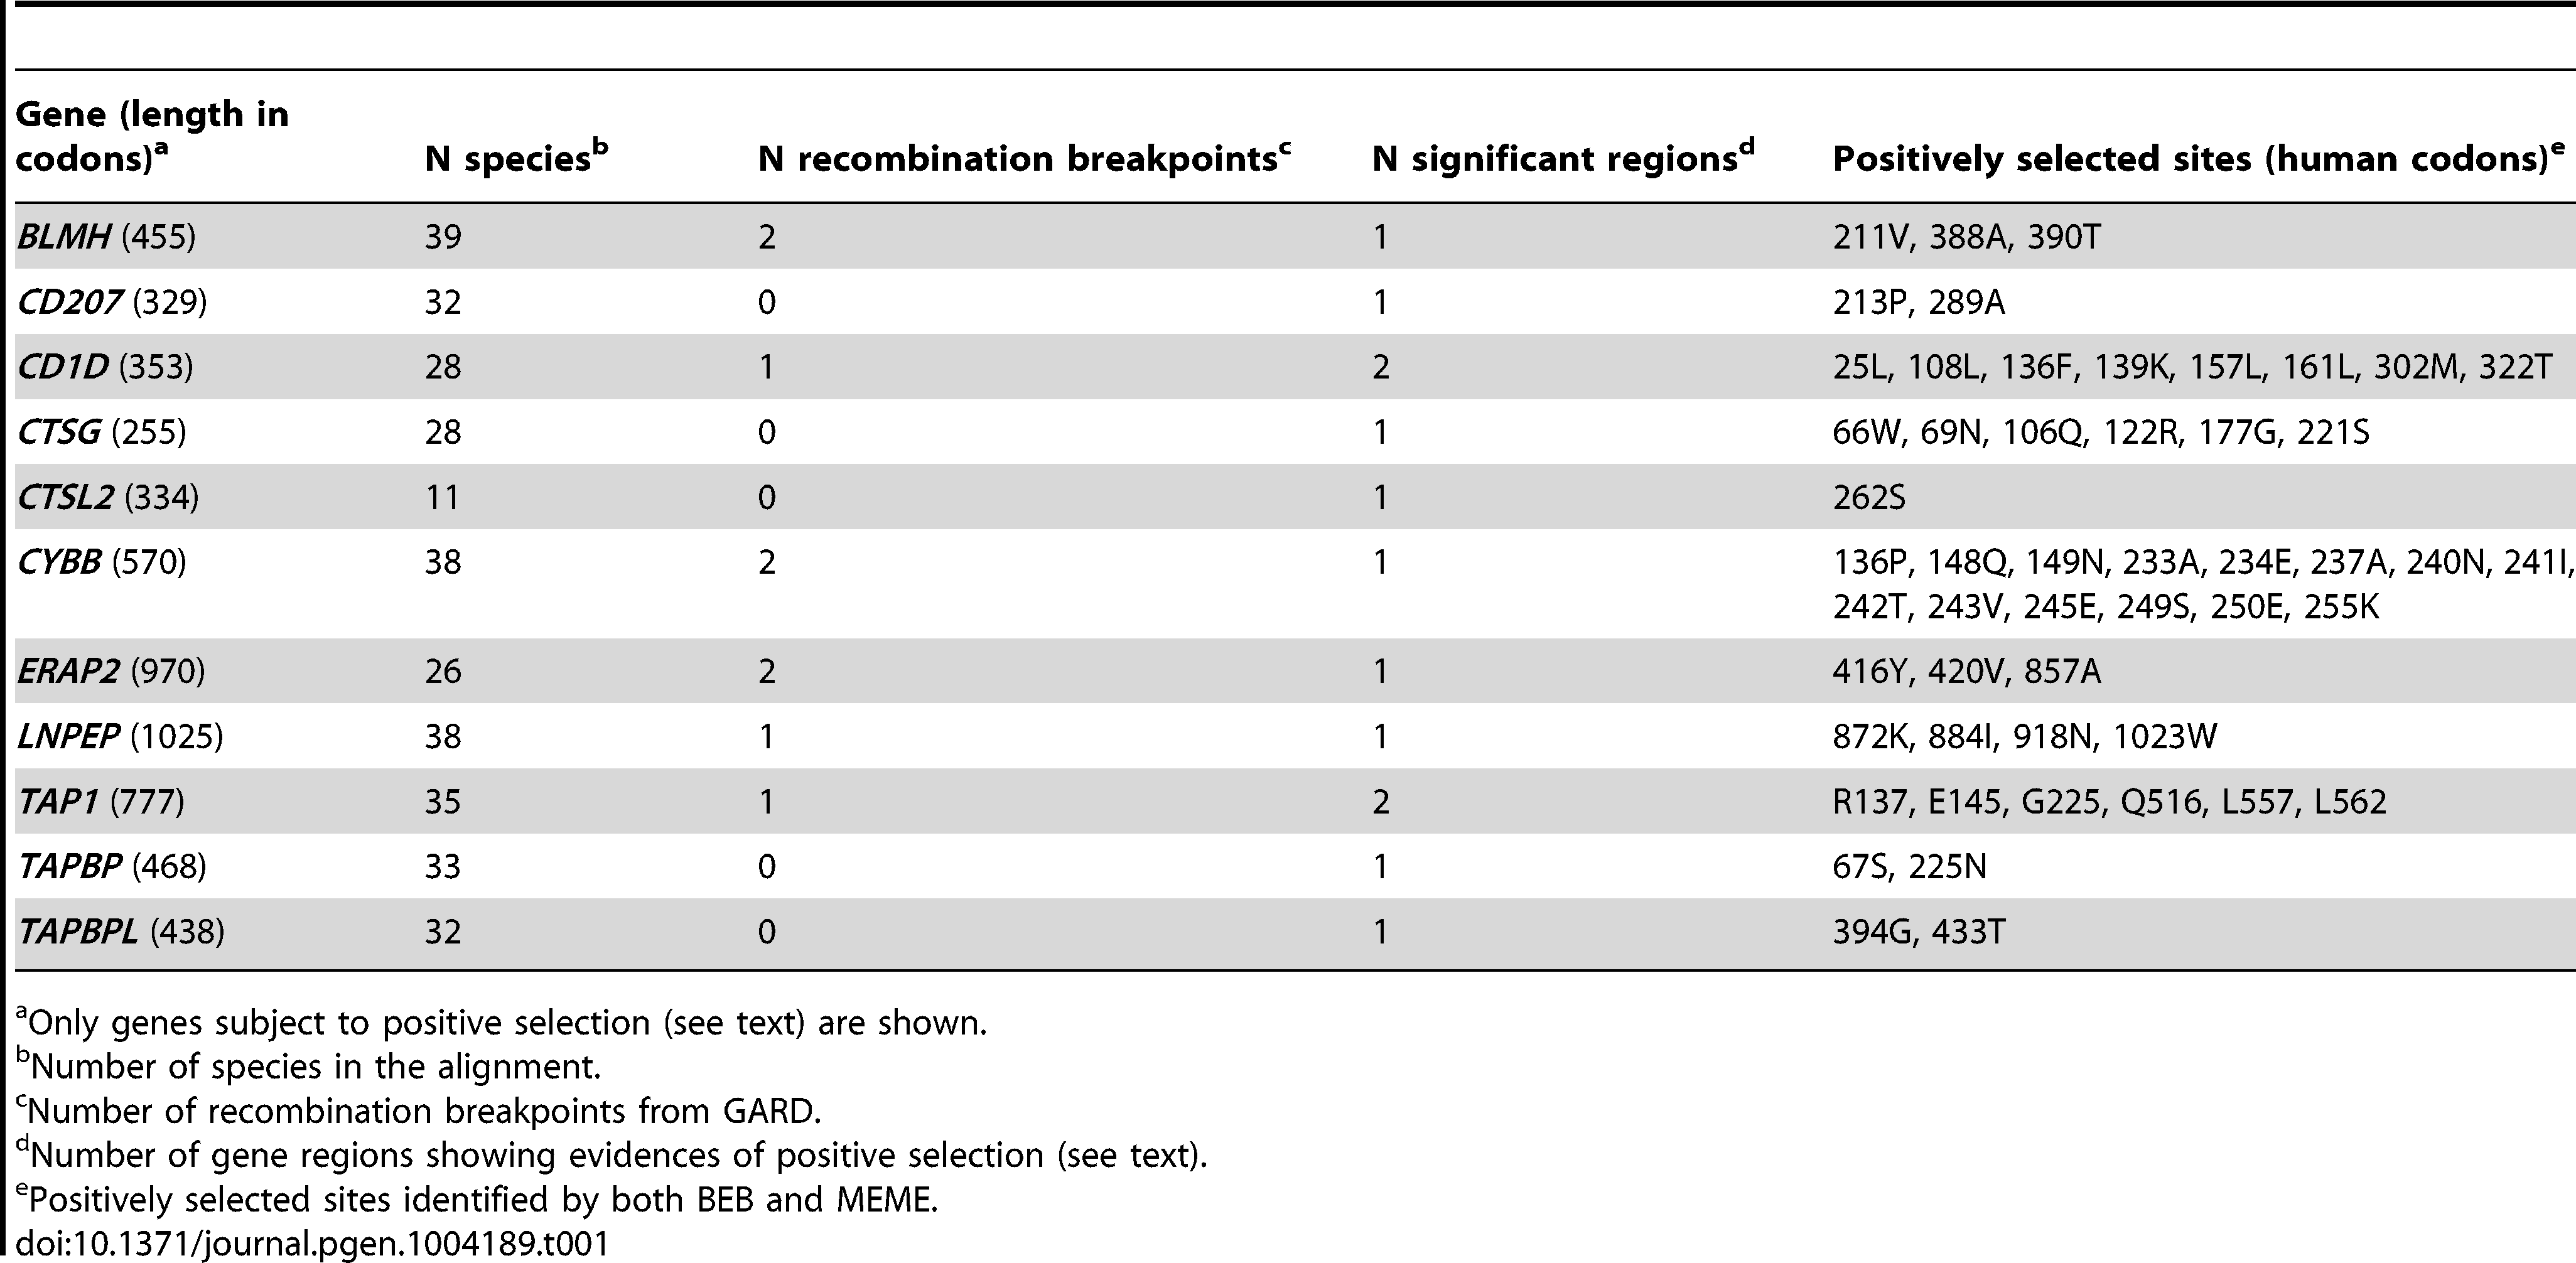 Evolutionary analysis of mammalian/primate APP genes.